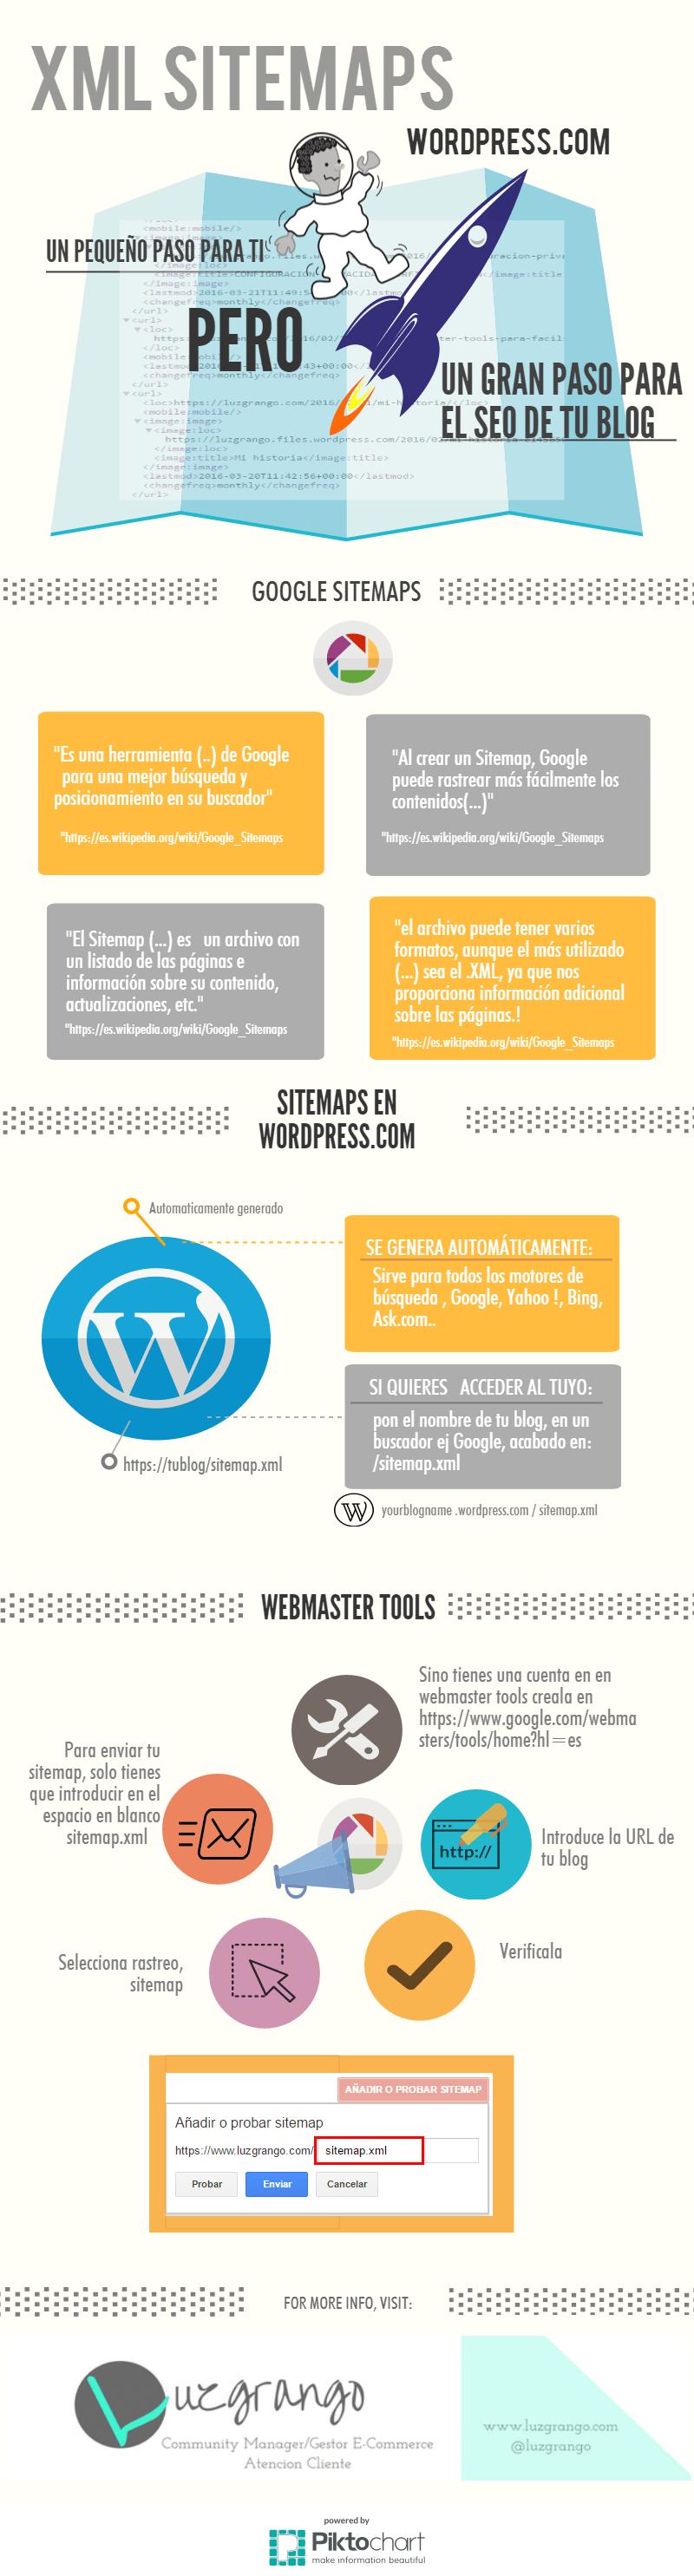 sitemap-wordpress.com-seo